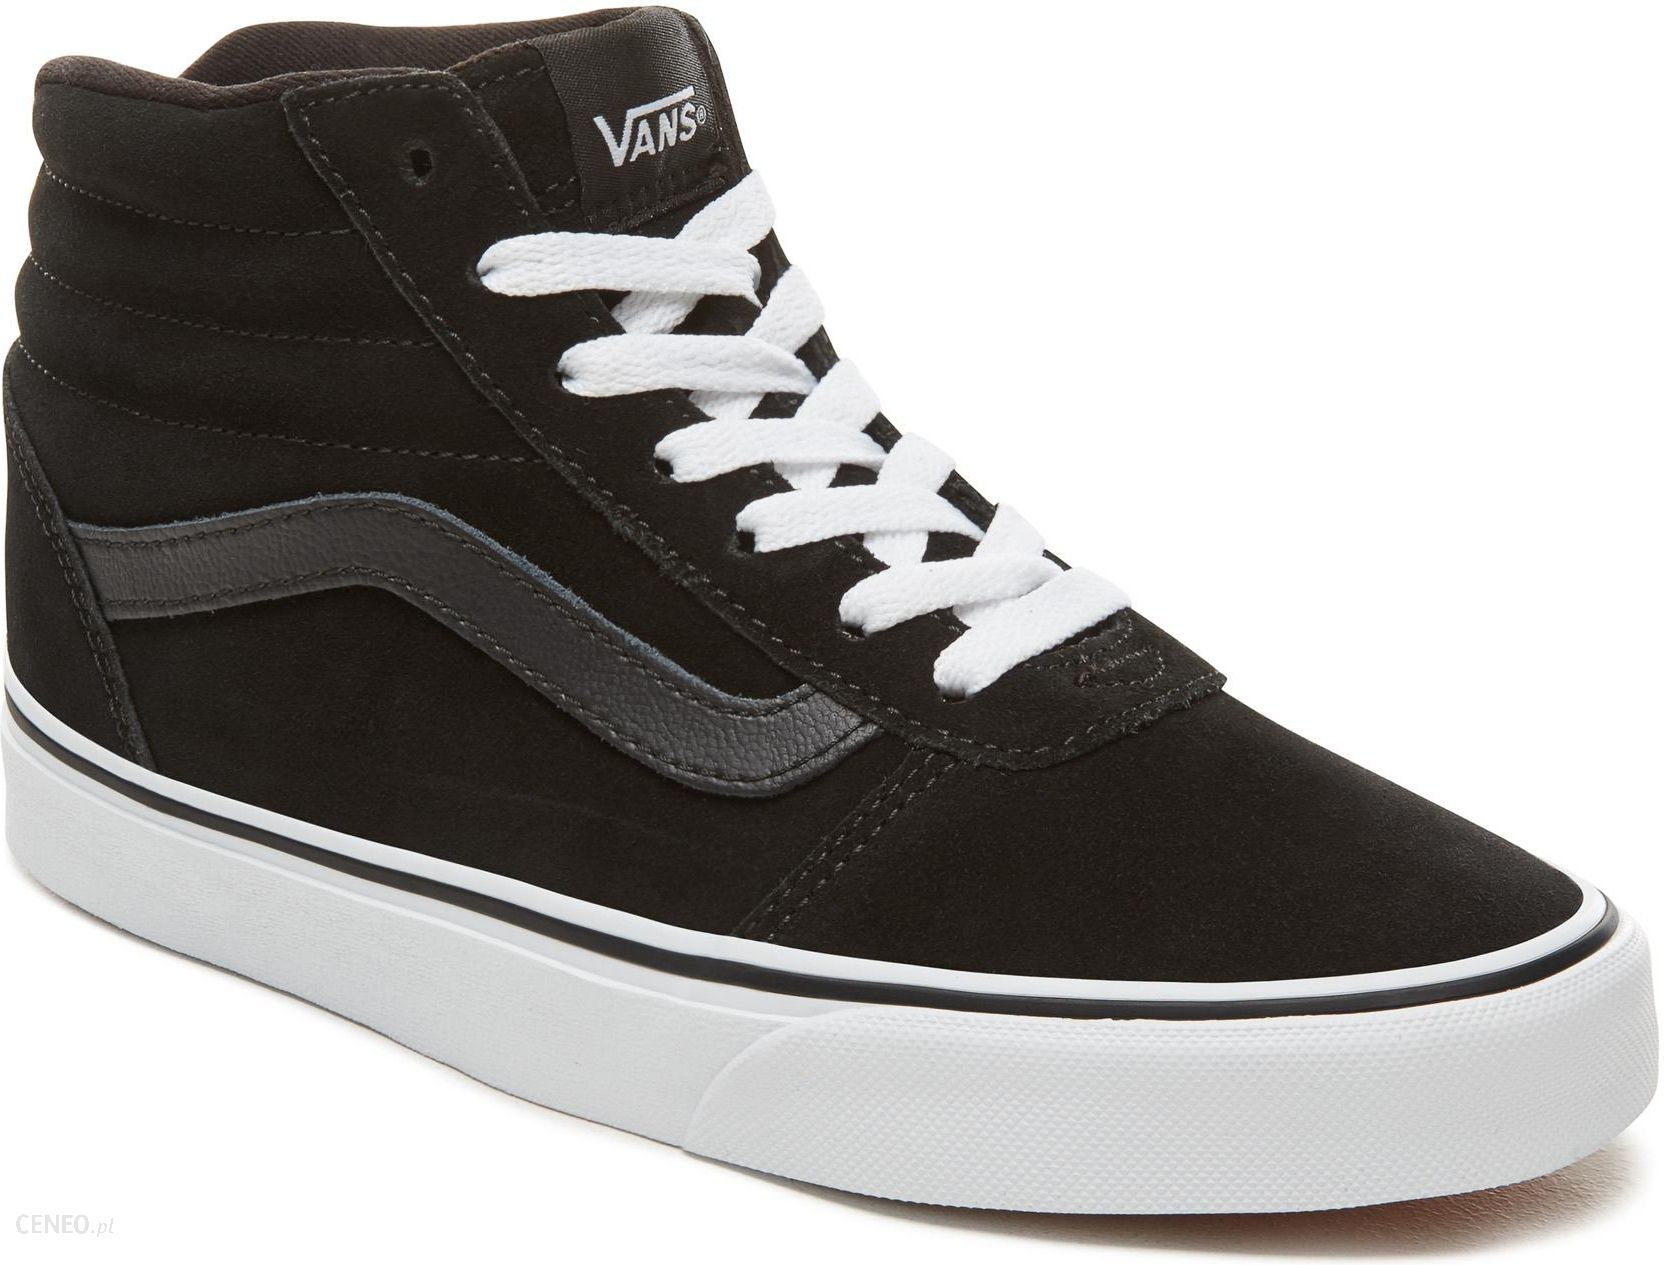 Vans damskie buty Wm Ward Hi Suede, Black, 37 Ceny i opinie Ceneo.pl